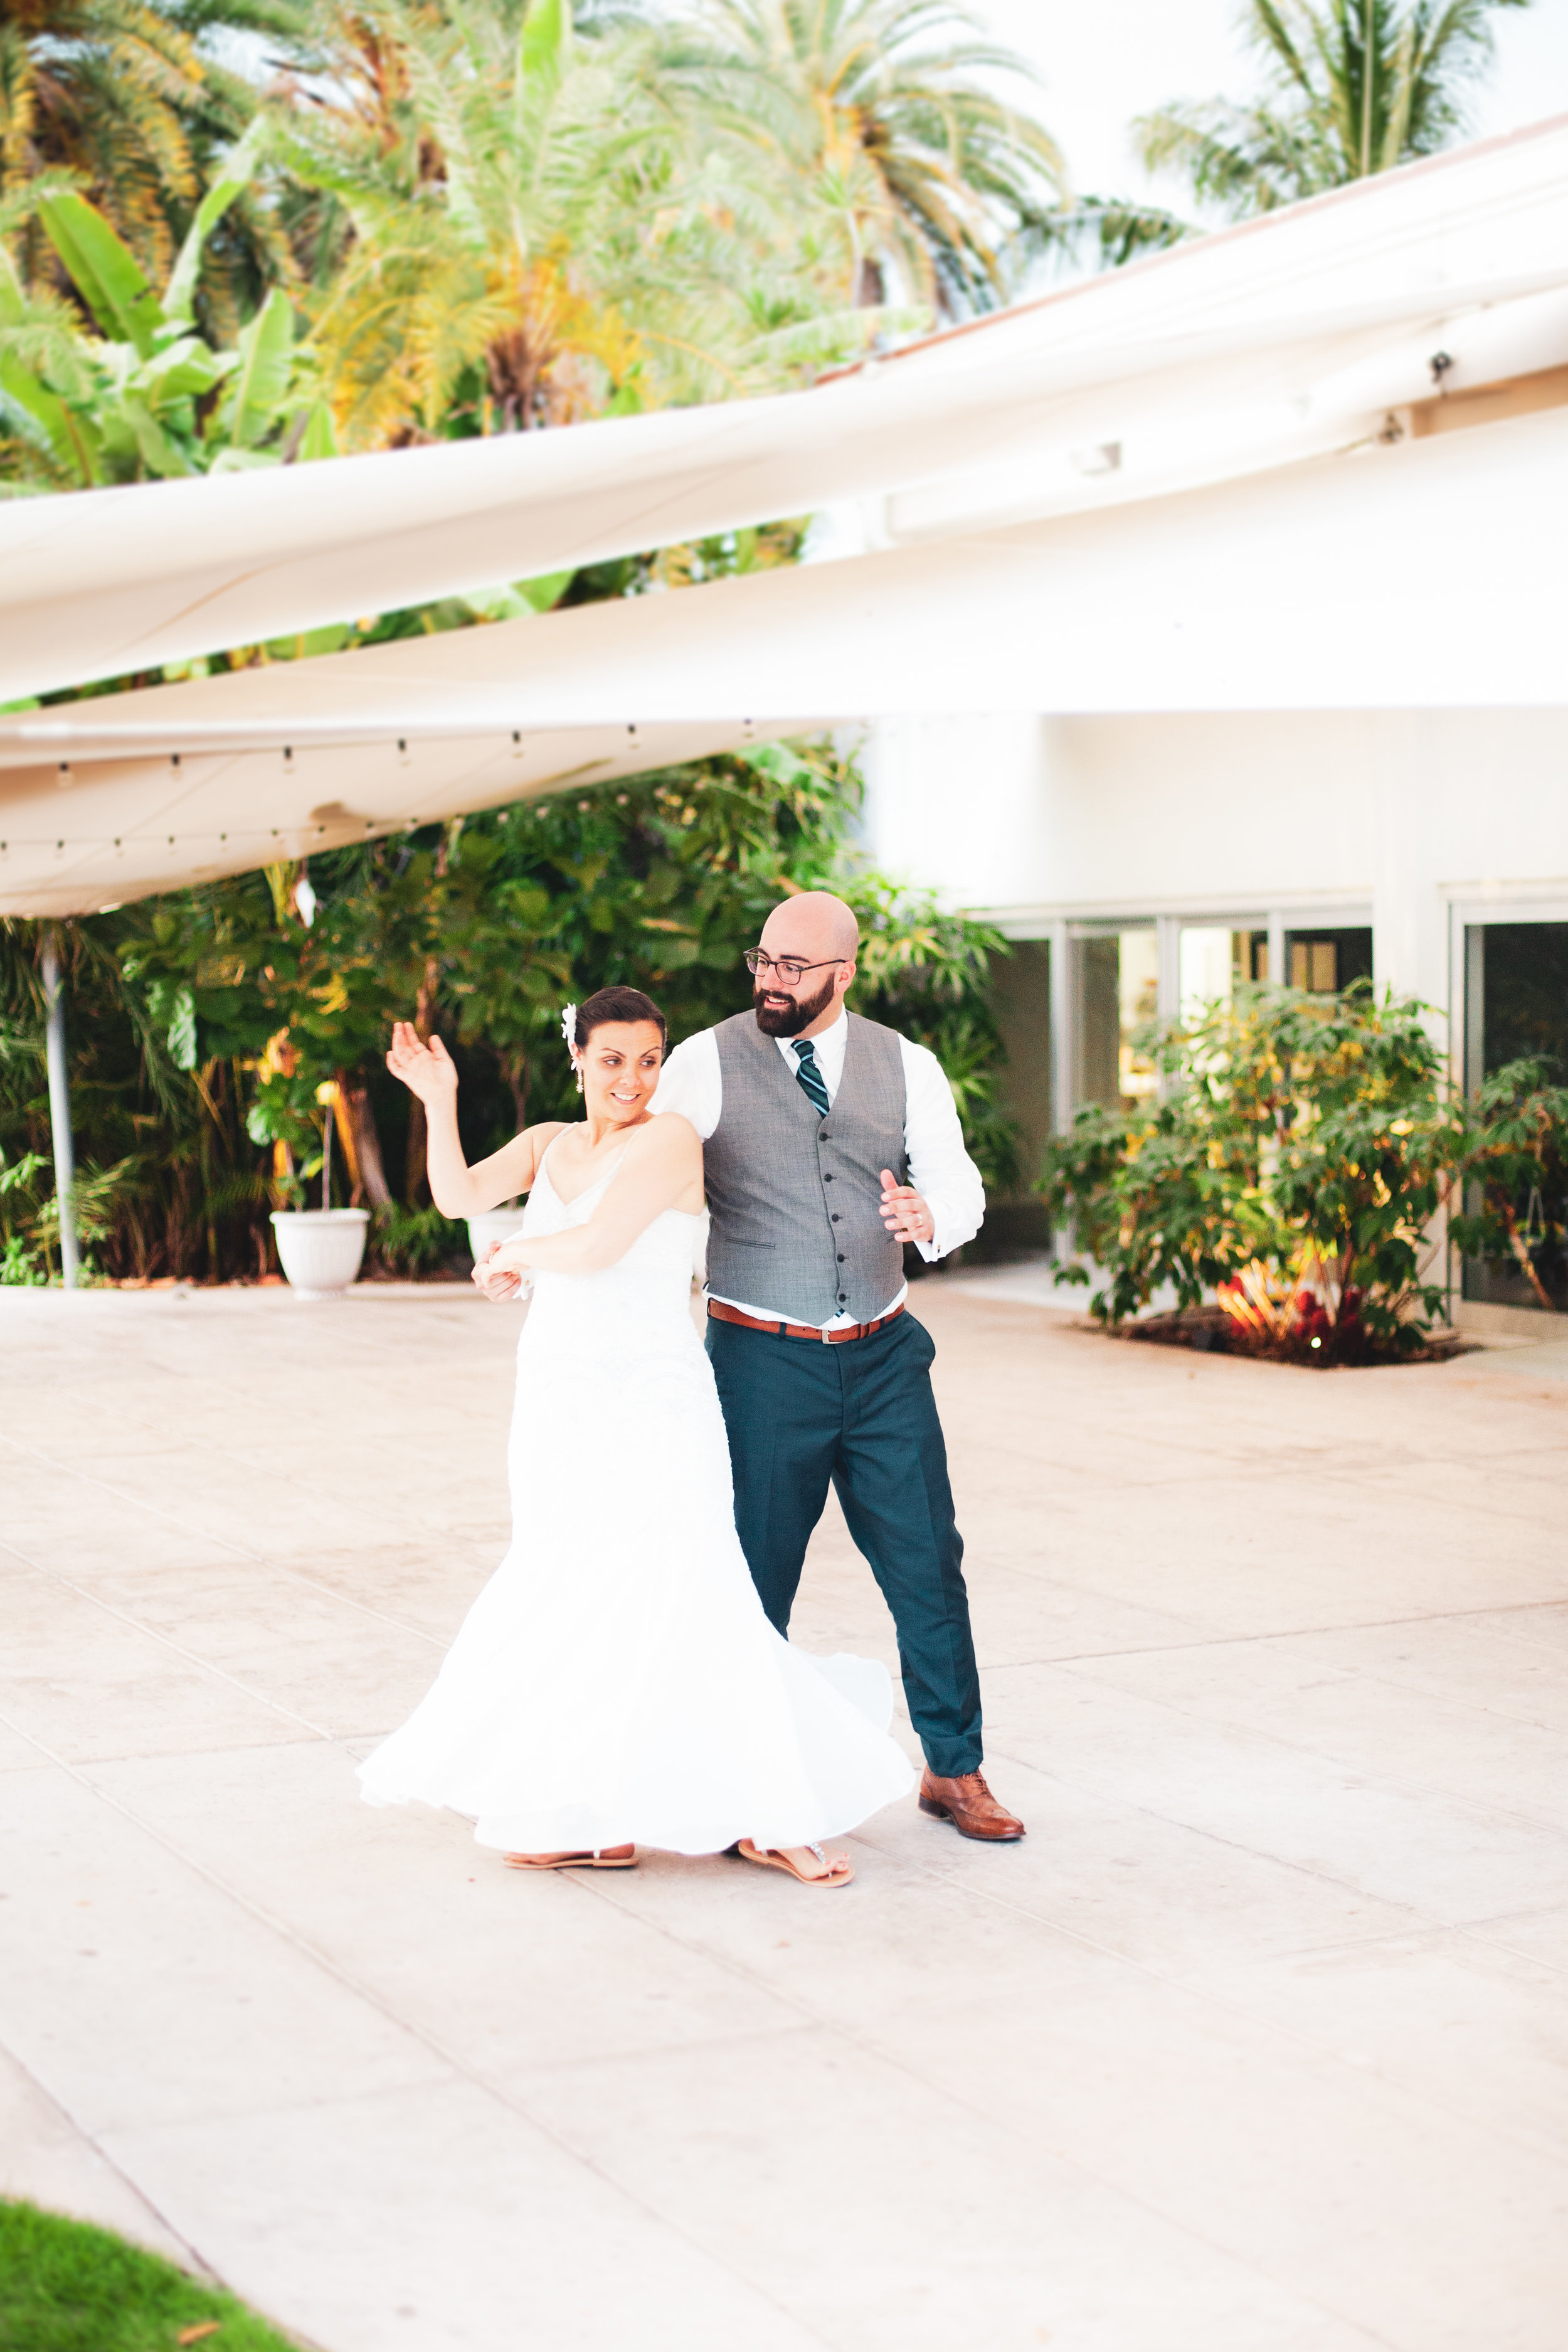 miami beach botanical garden florida wedding © kelilina photography 20190601135633-5.jpg